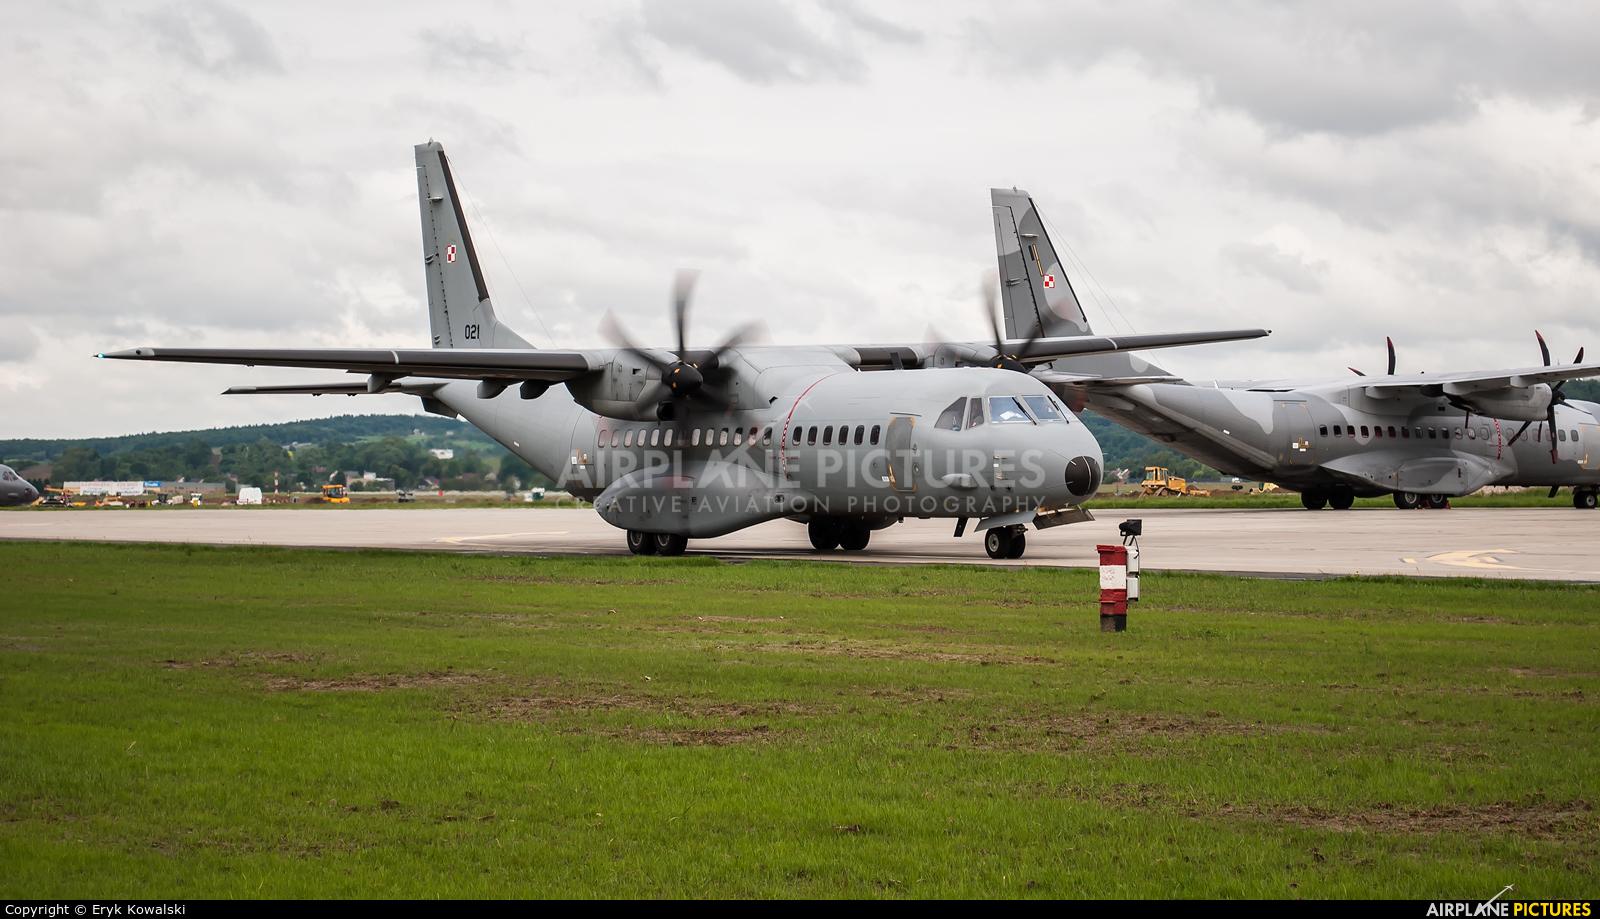 Poland - Air Force 021 aircraft at Kraków - John Paul II Intl